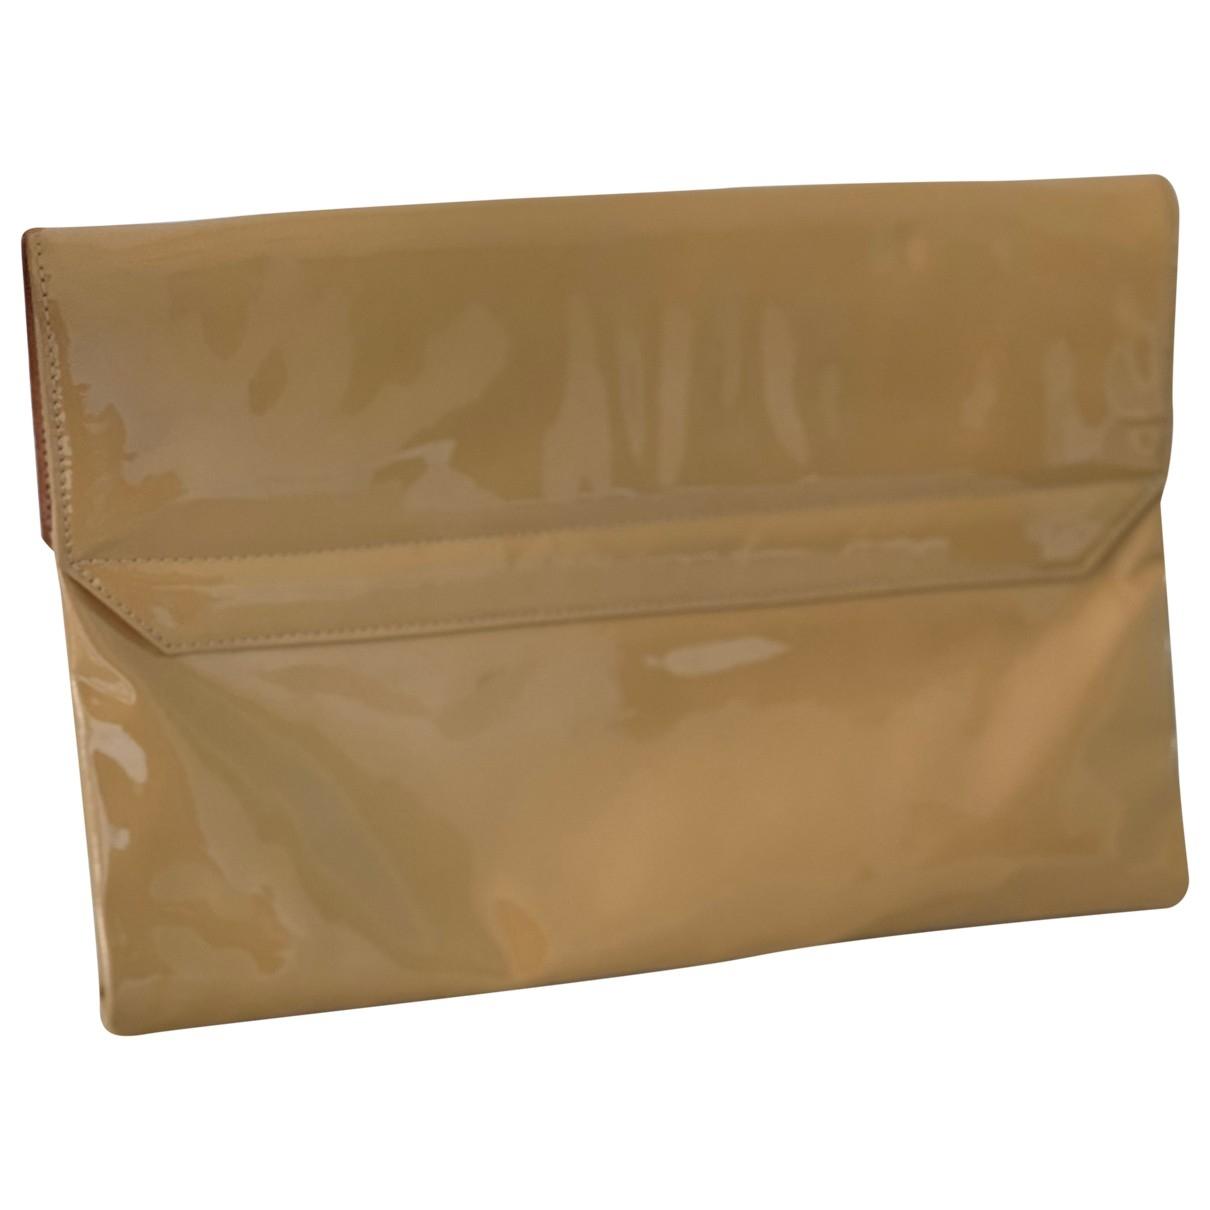 Casadei \N Beige Patent leather handbag for Women \N